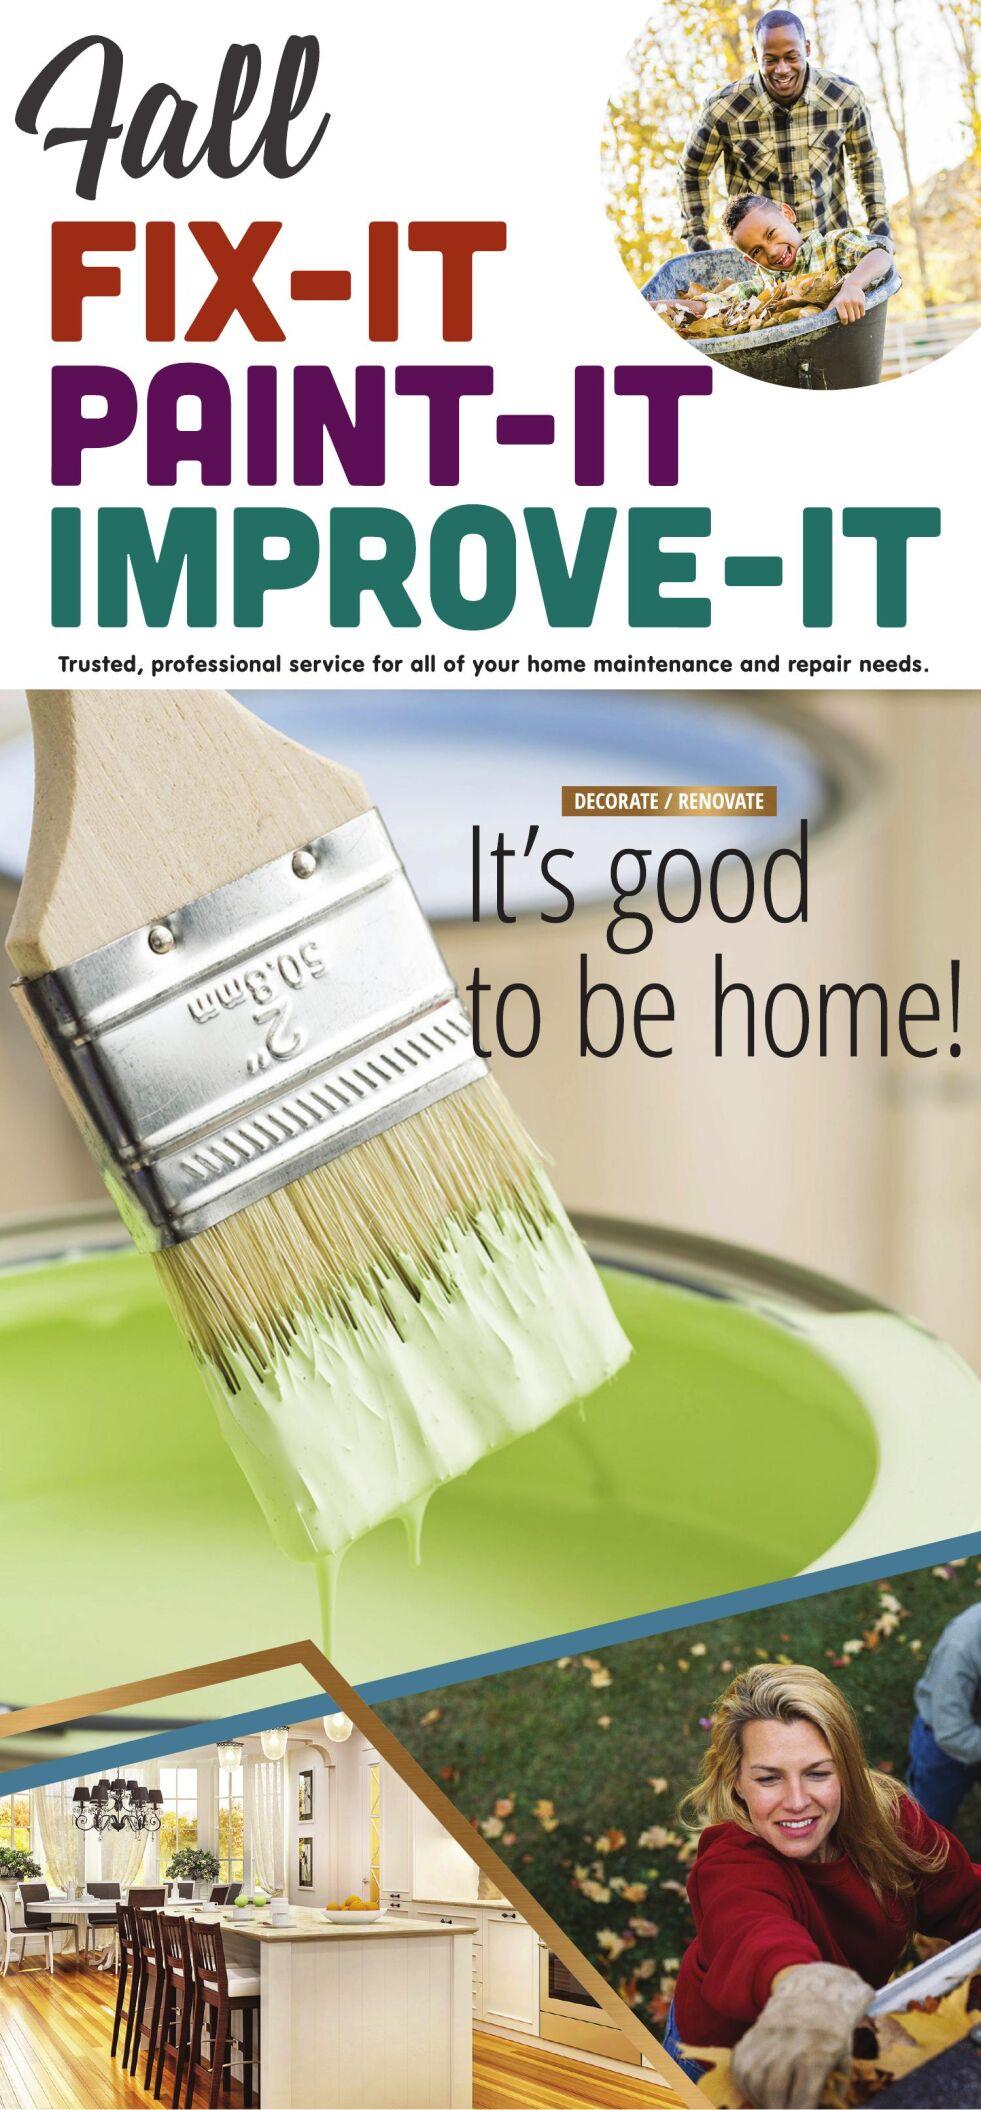 Fall Home Improvement